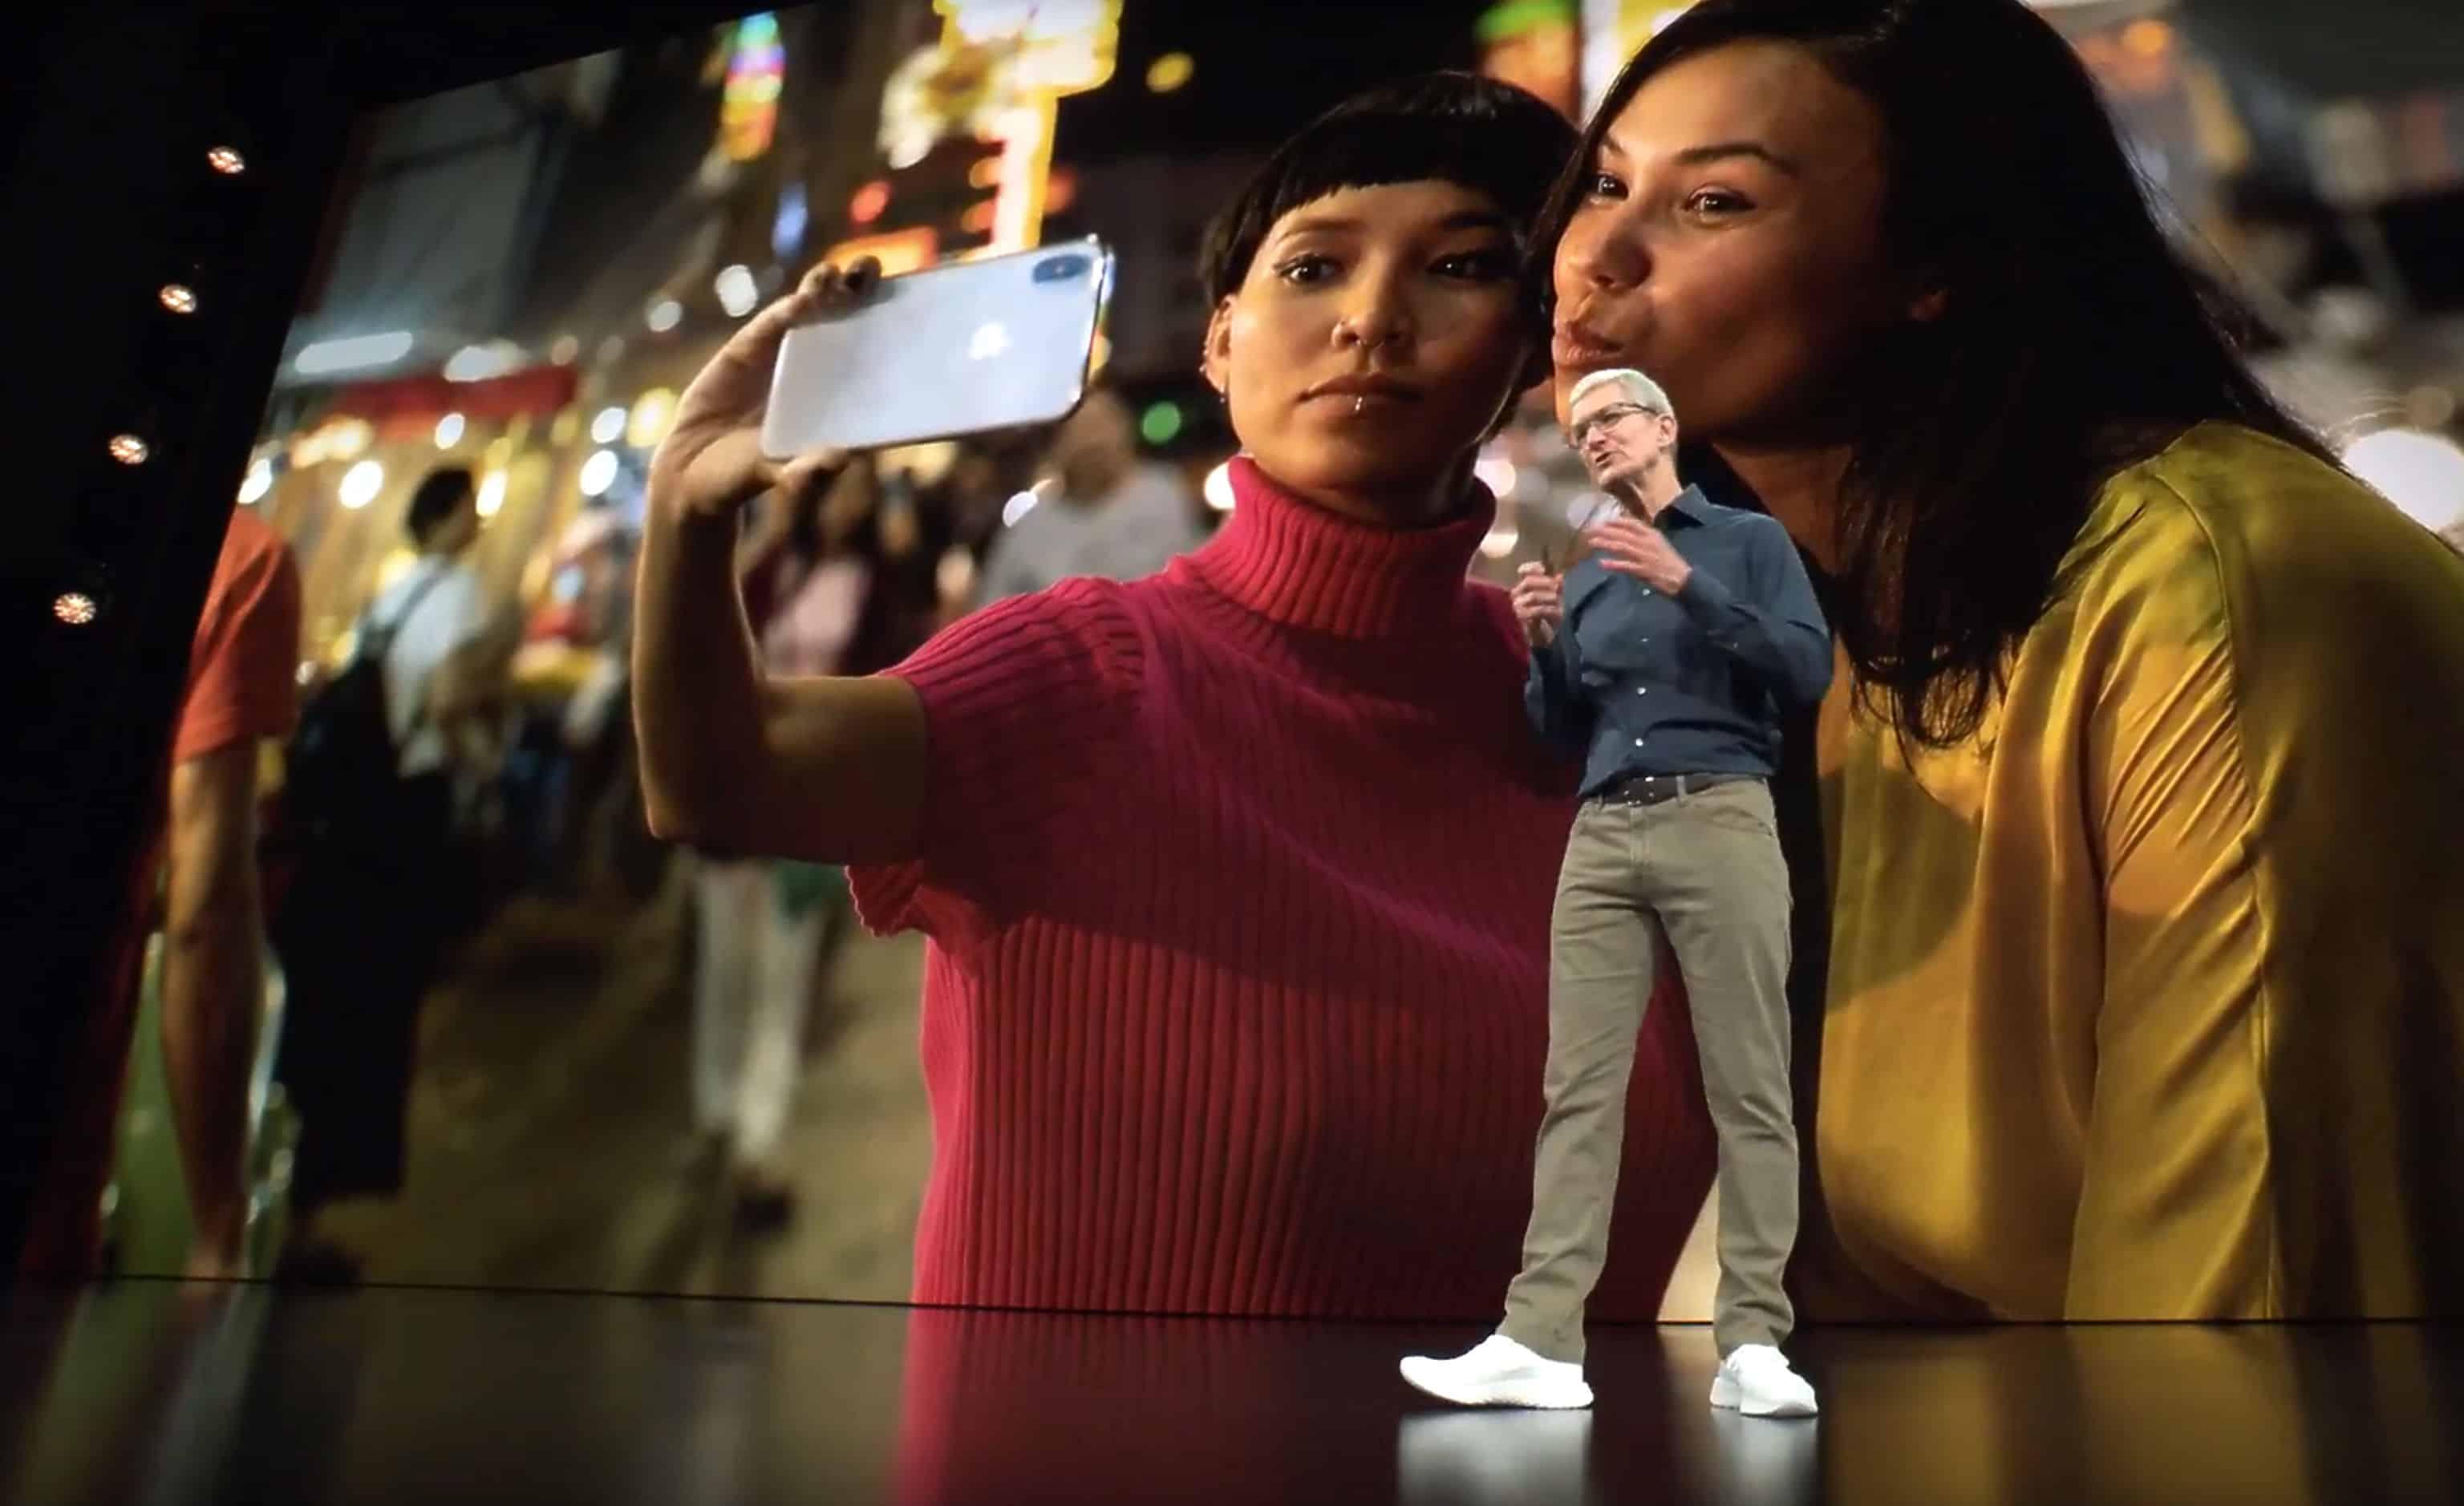 iPhone XS selfies